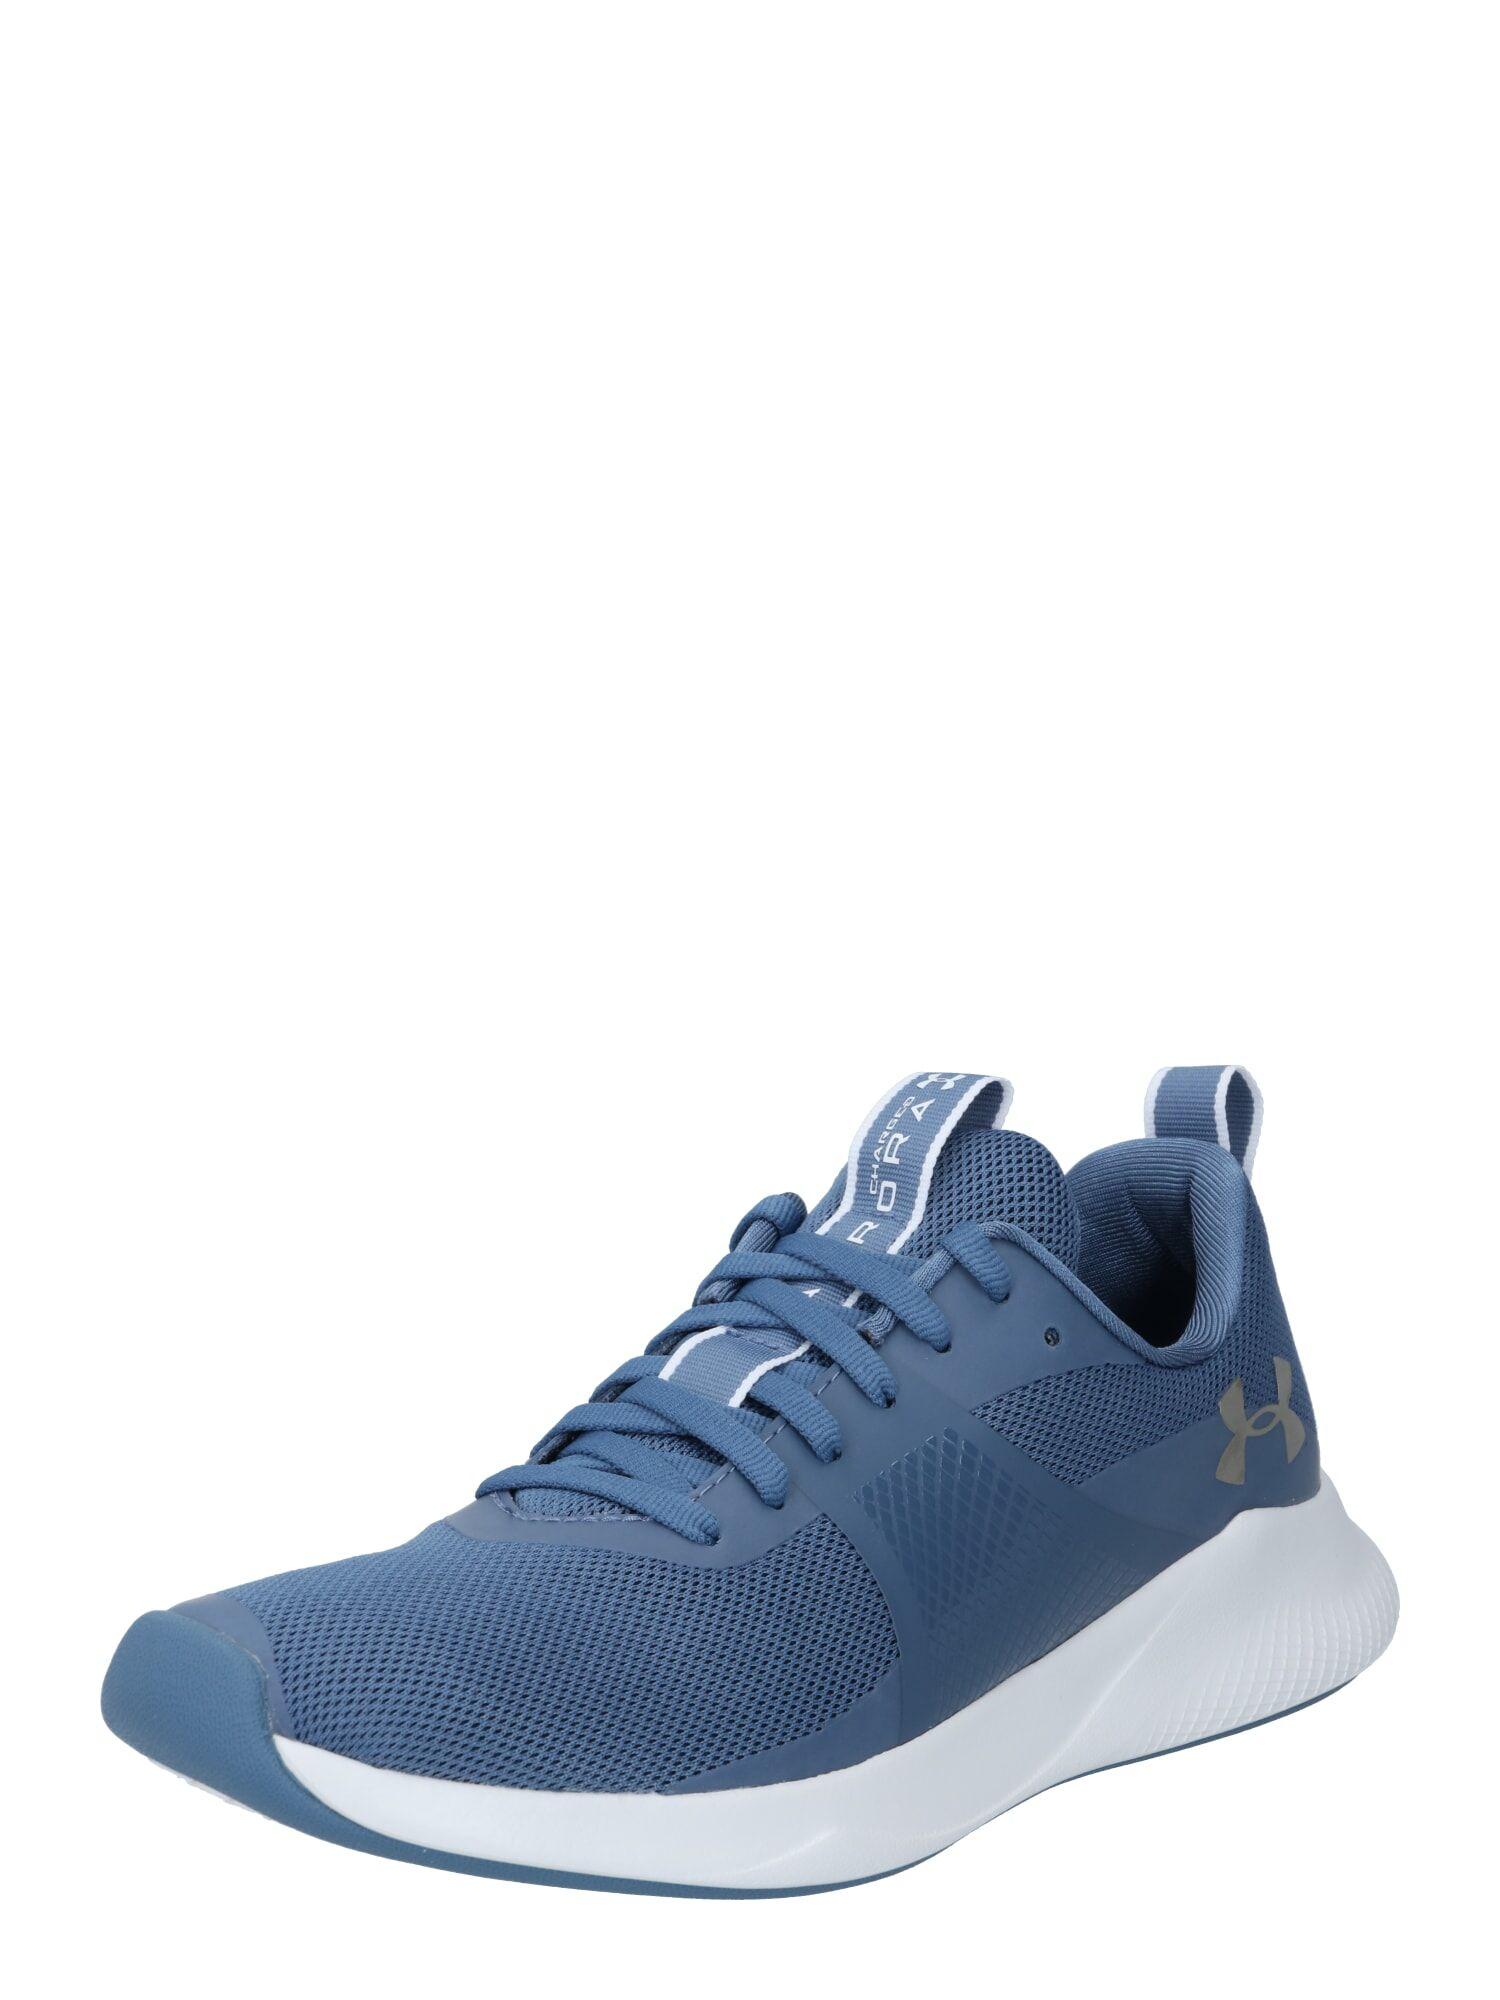 UNDER ARMOUR Chaussure de sport 'Aurora'  - Bleu - Taille: 5.5 - female